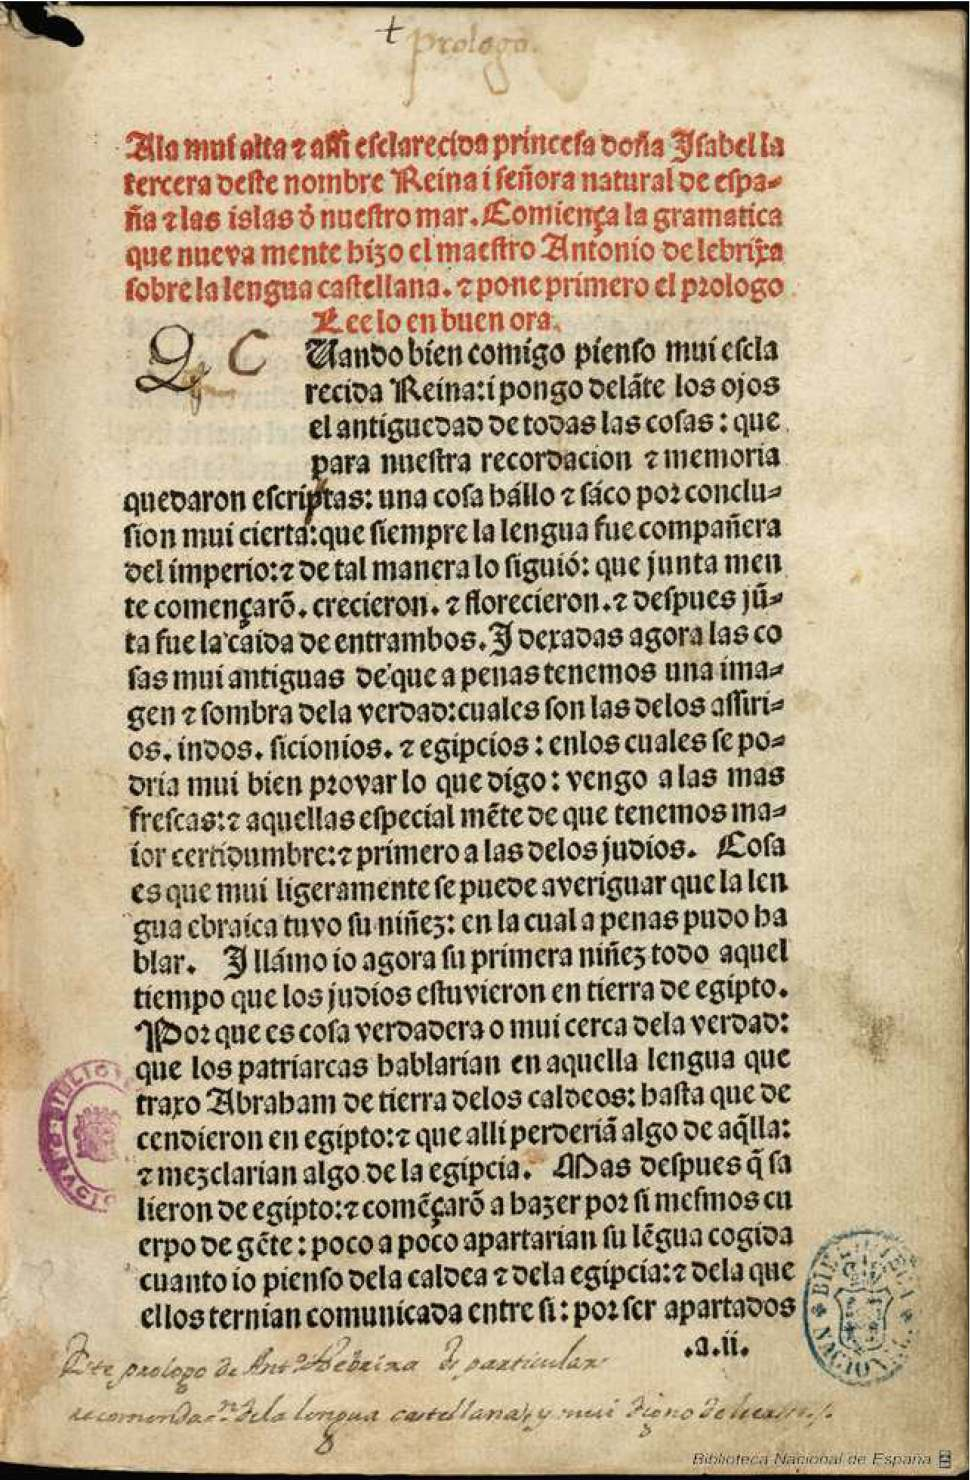 Gramatica_castellana_Nebrija_1492-español-politica